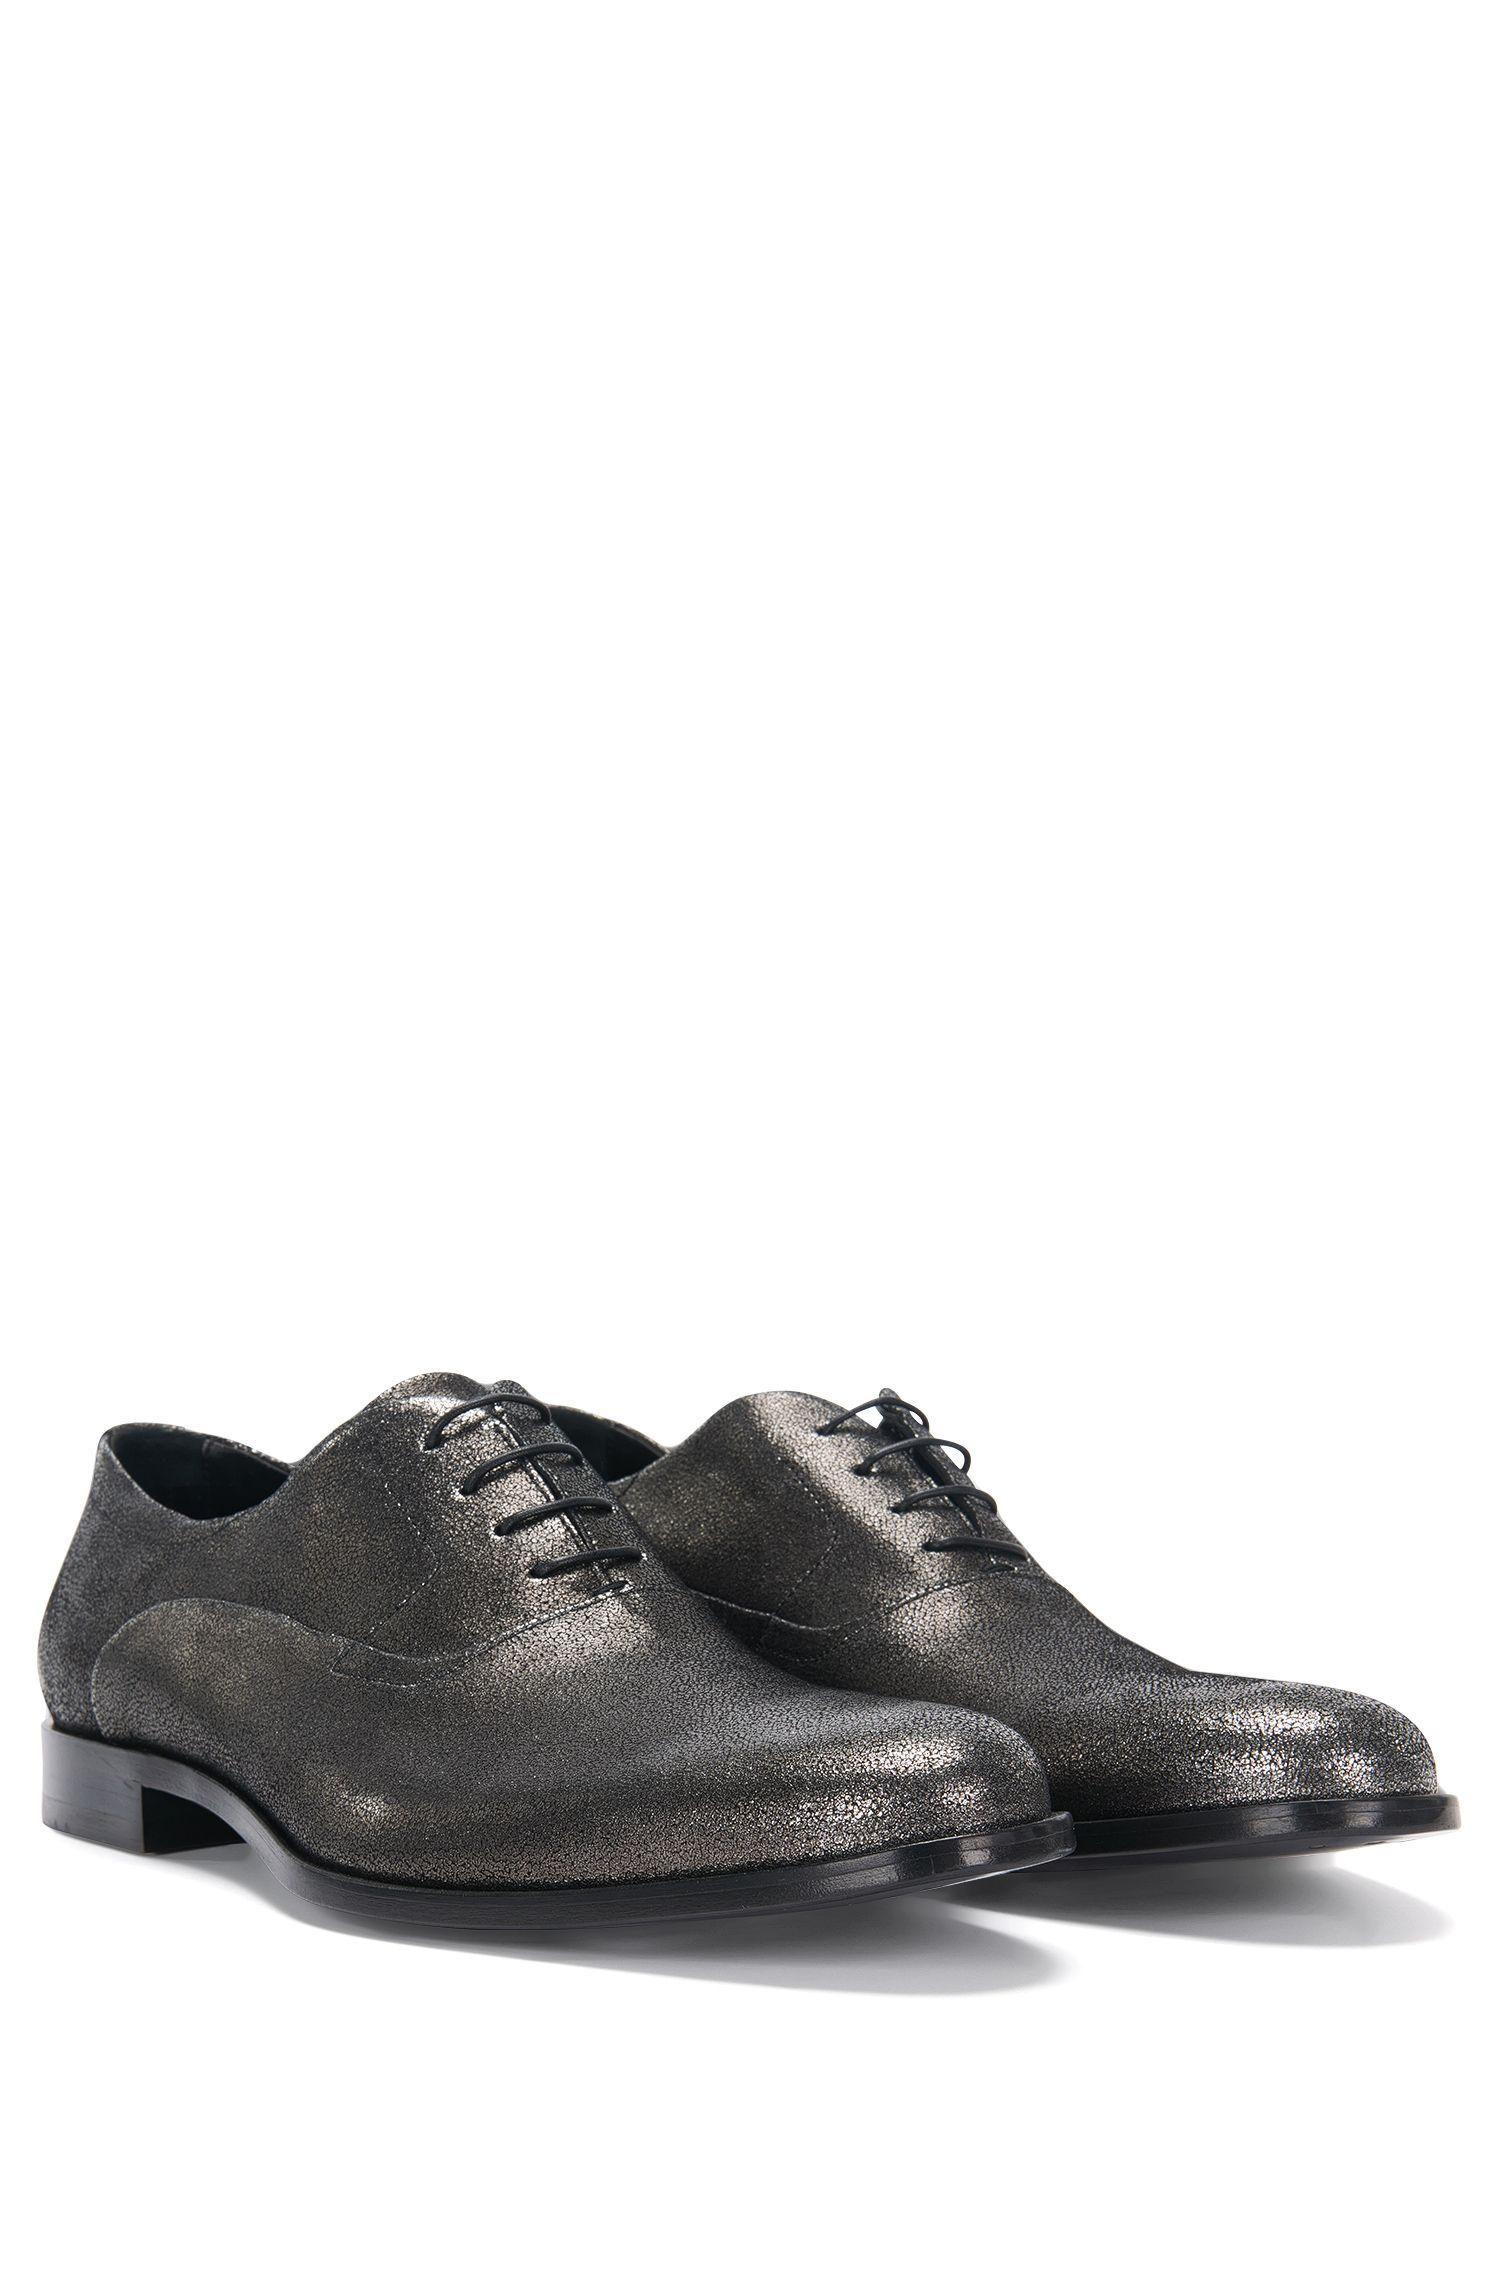 'Sigma Oxfr Sdgl' | Italian Calfskin Suede Metallic Oxford Shoes